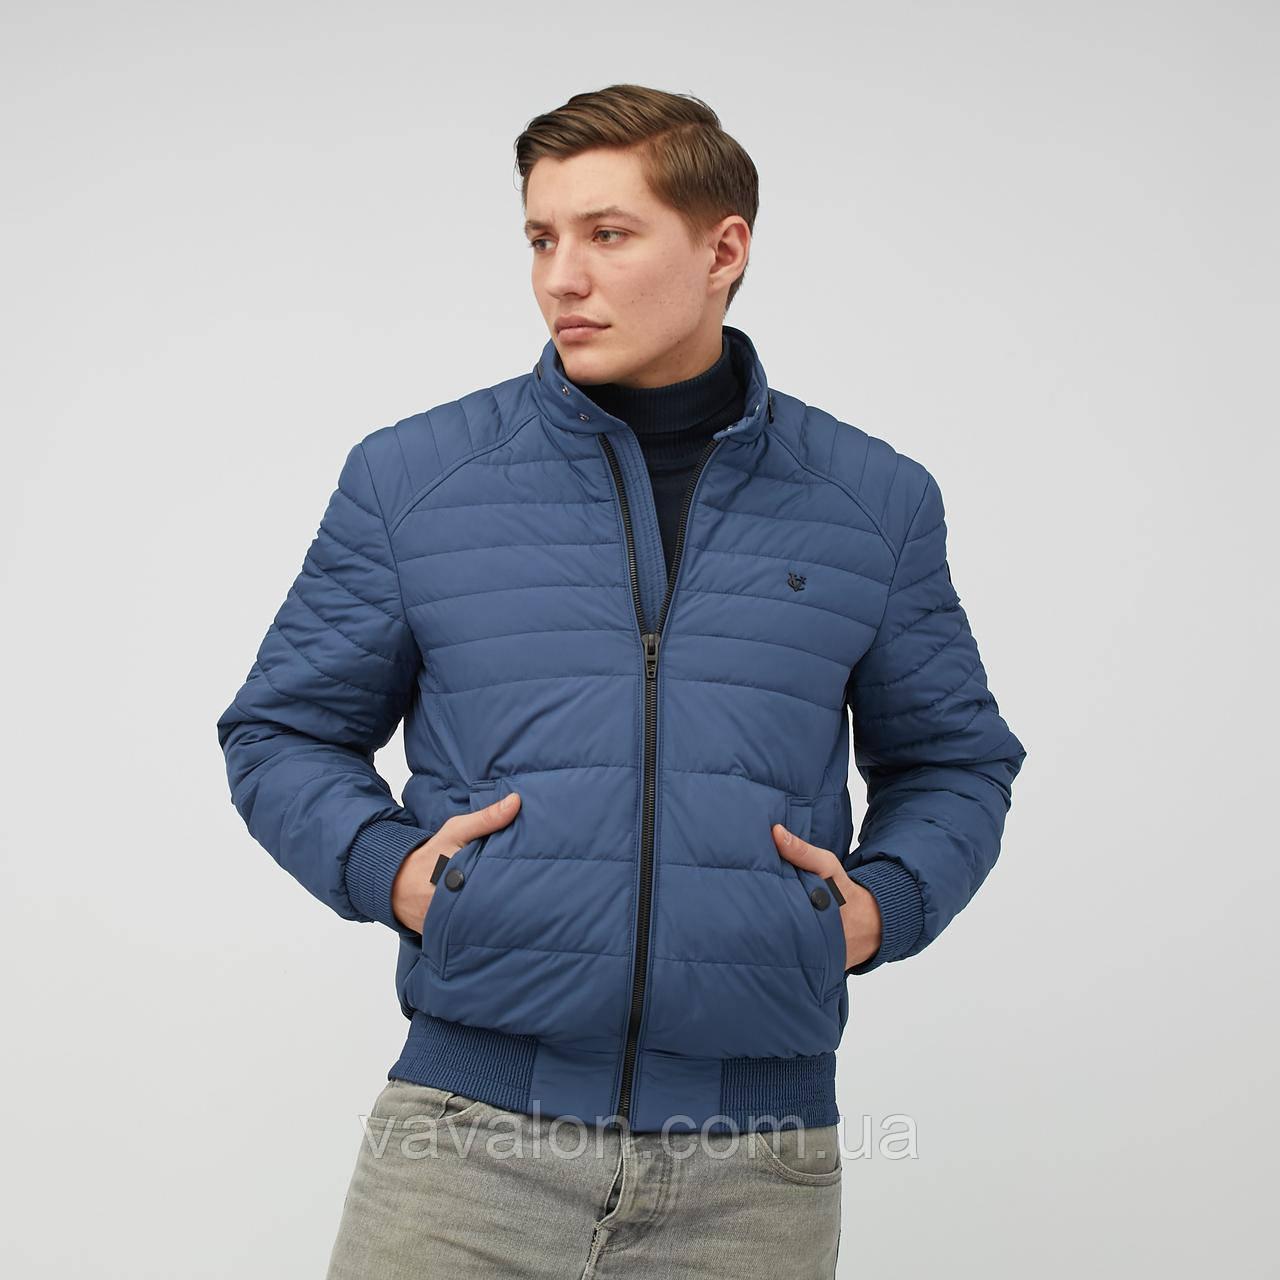 Куртка демисезонная под резинку Vavalon KD-193 ink-blue